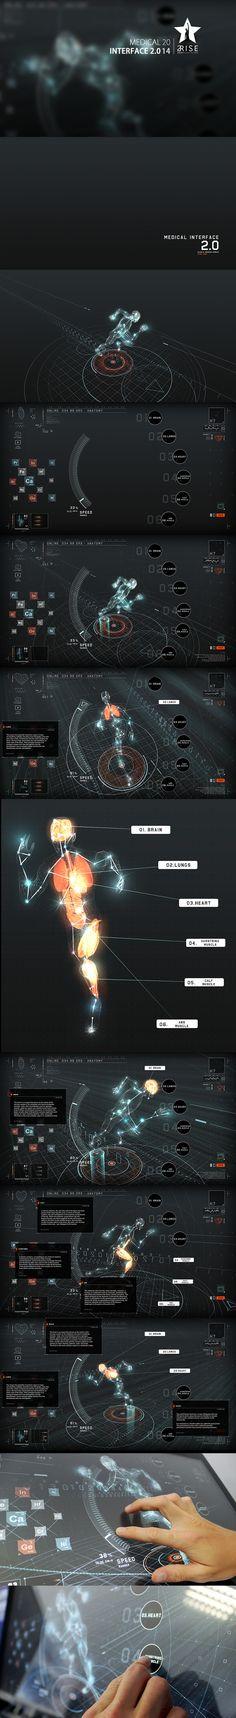 MEDICAL INTERFACE 2.0 by http://Jedi88.deviantart.com on @deviantART